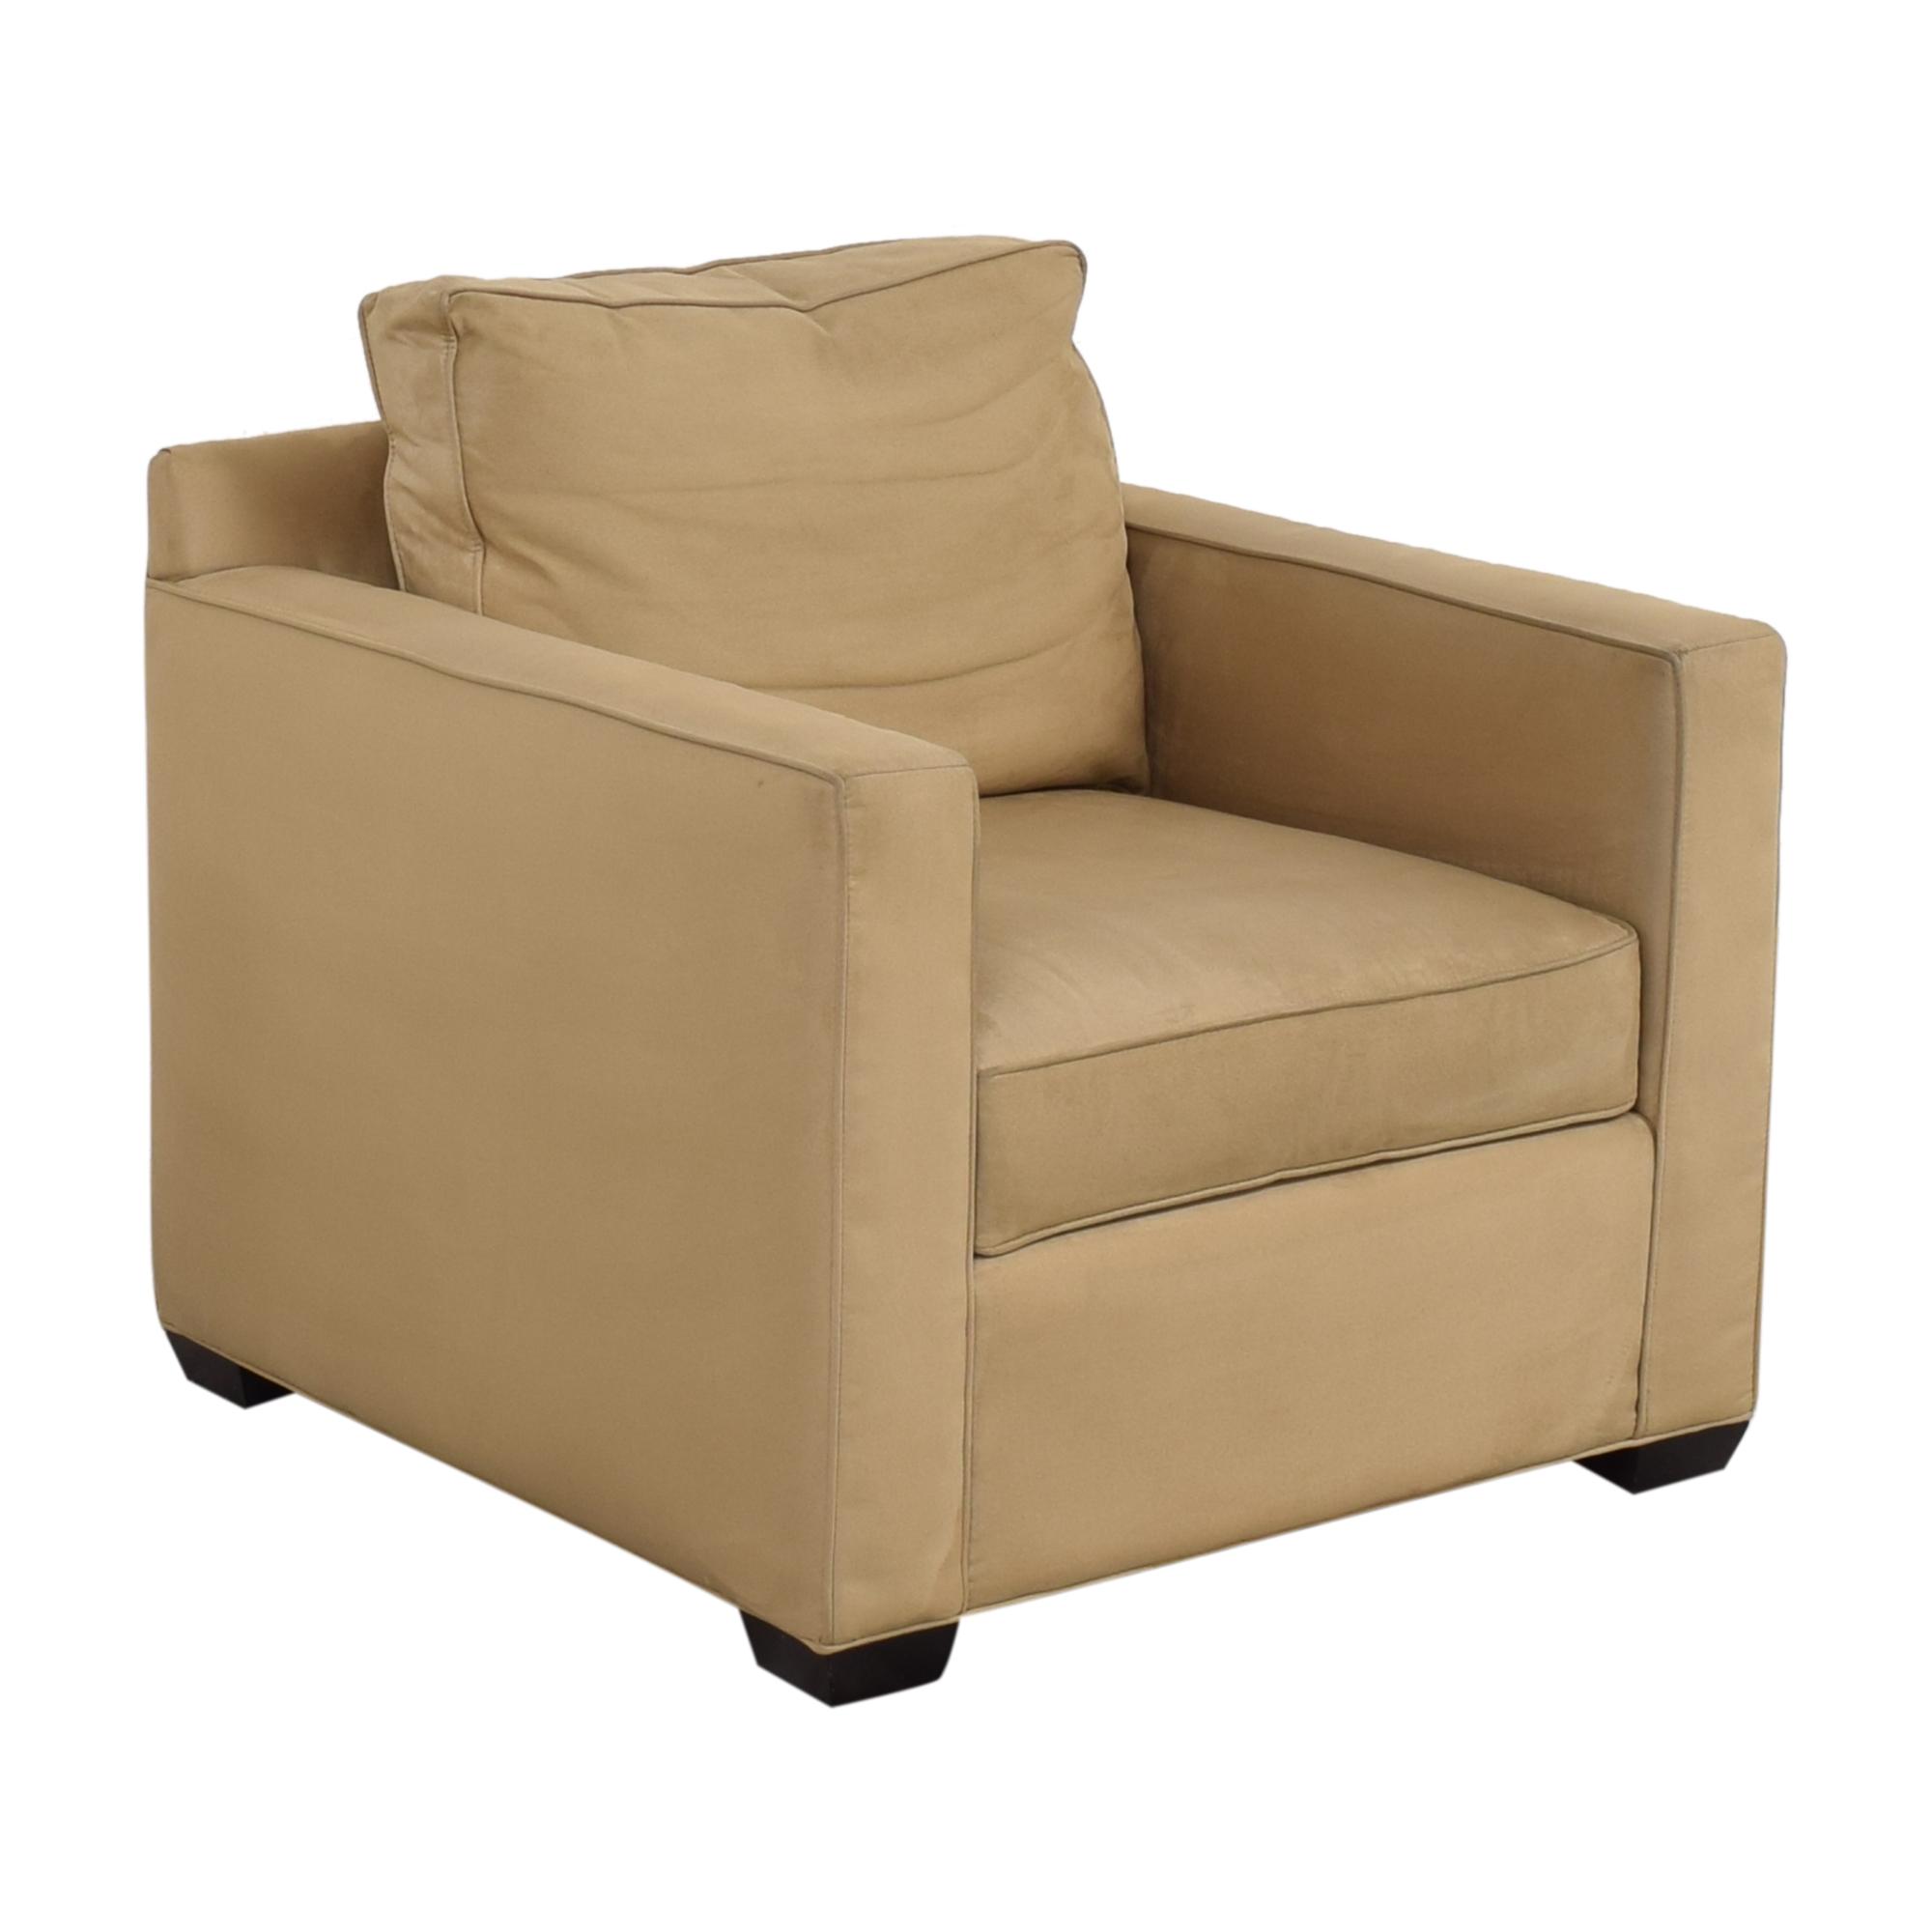 buy Crate & Barrel Davis Beige Accent Chair Crate & Barrel